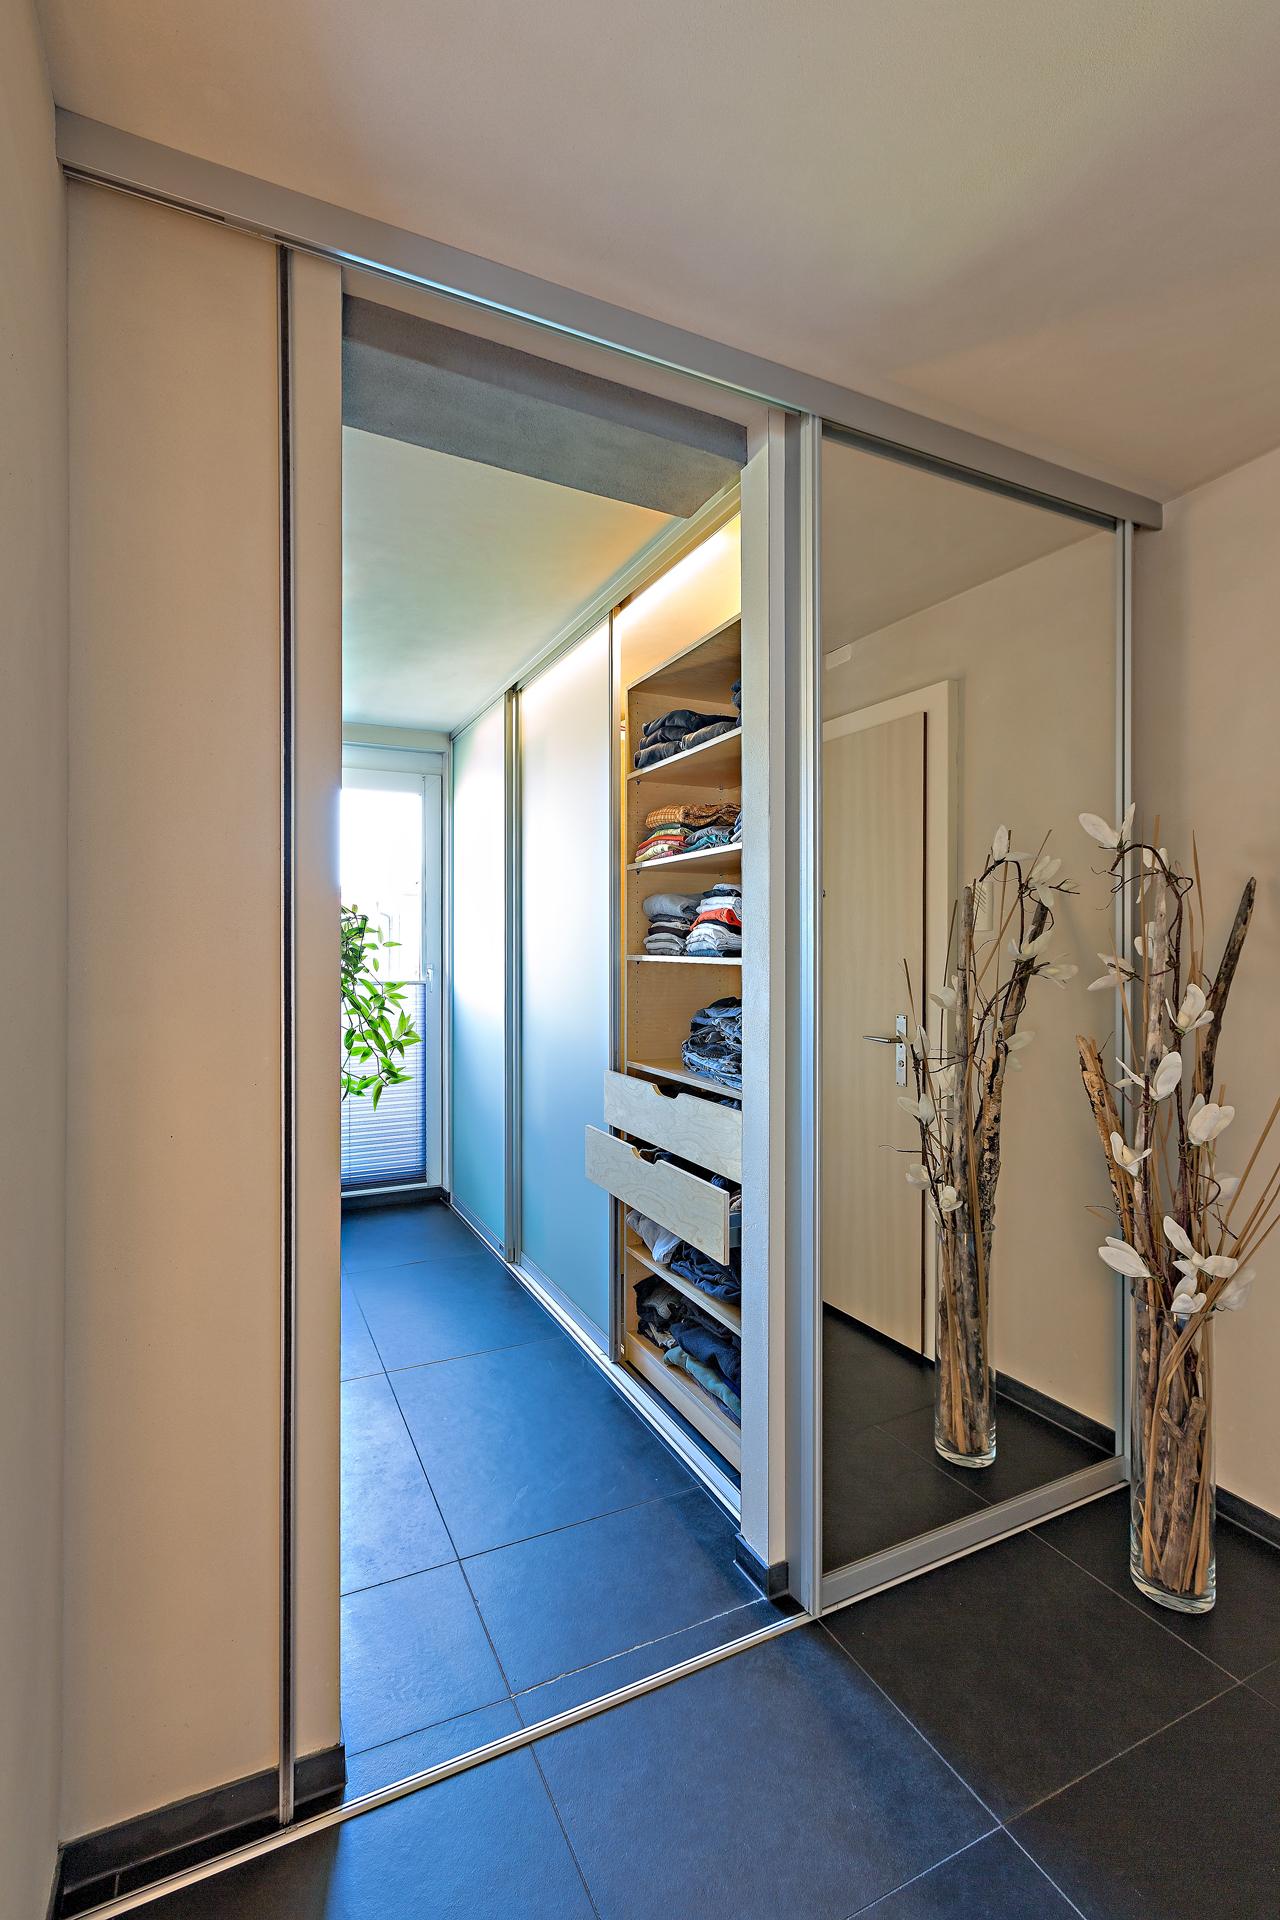 schiebet re in grossfl chigem spiegel als eingang ins. Black Bedroom Furniture Sets. Home Design Ideas